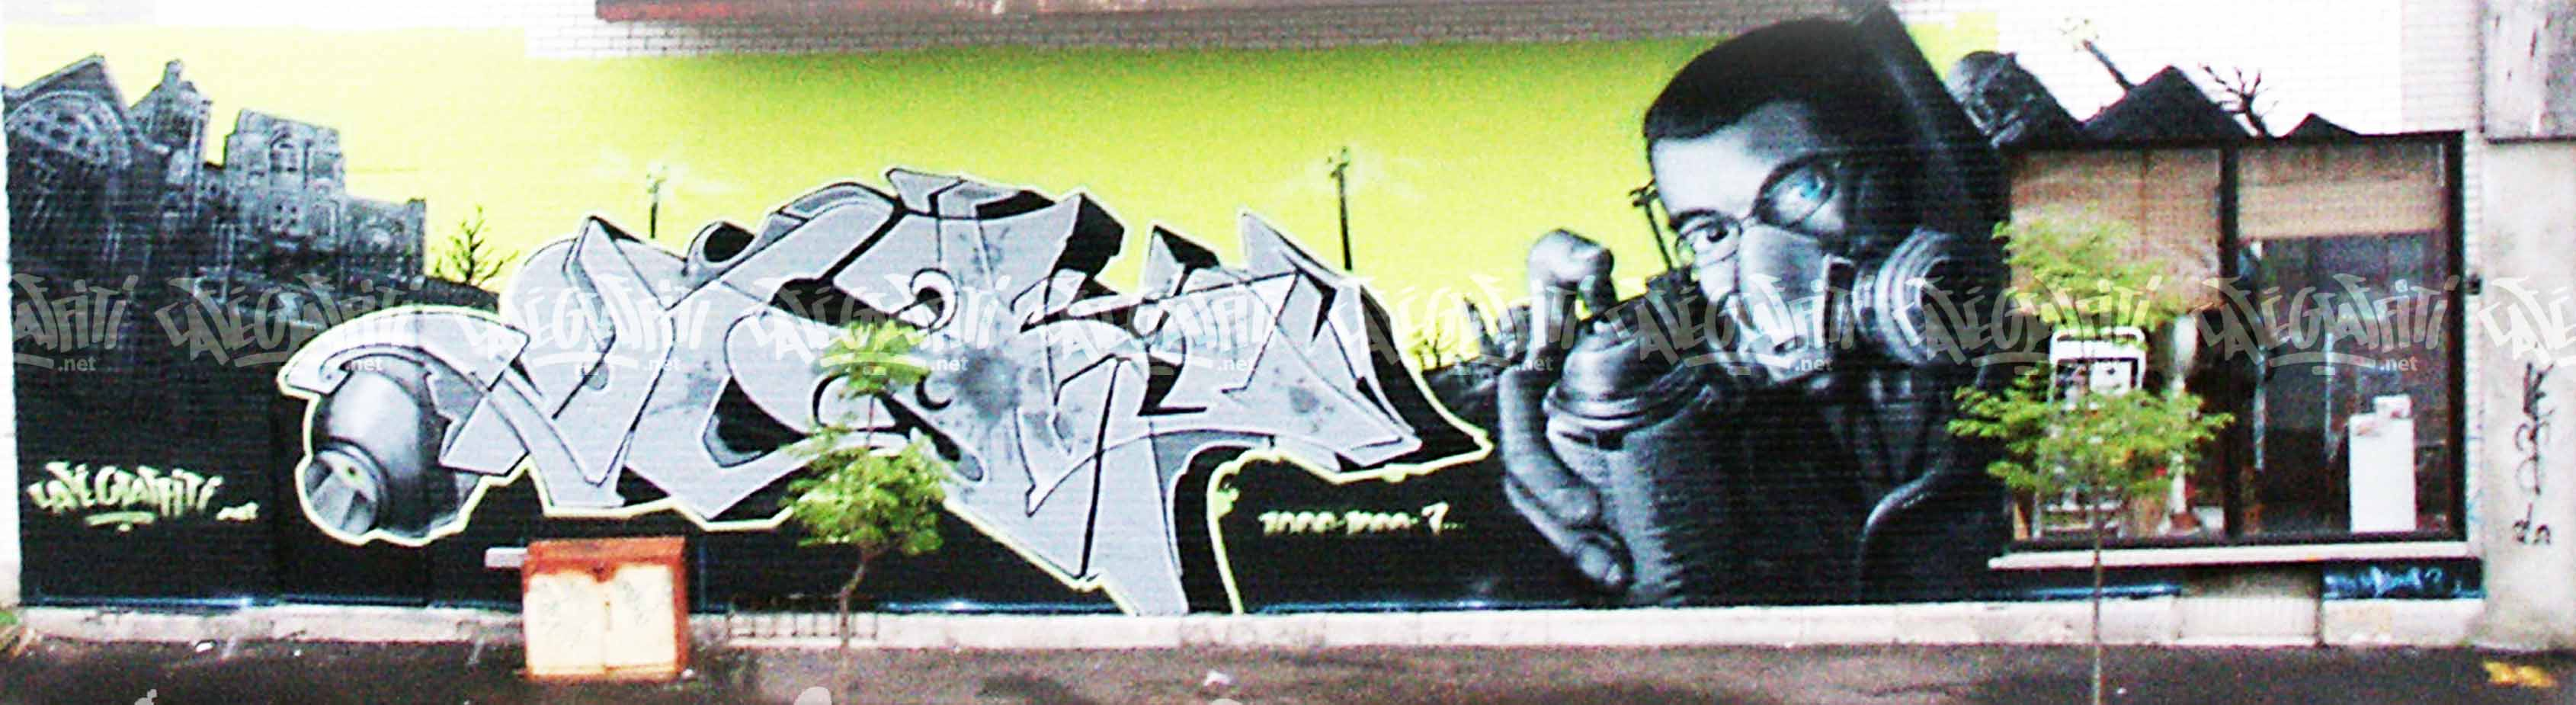 murales cafe graffiti. Black Bedroom Furniture Sets. Home Design Ideas